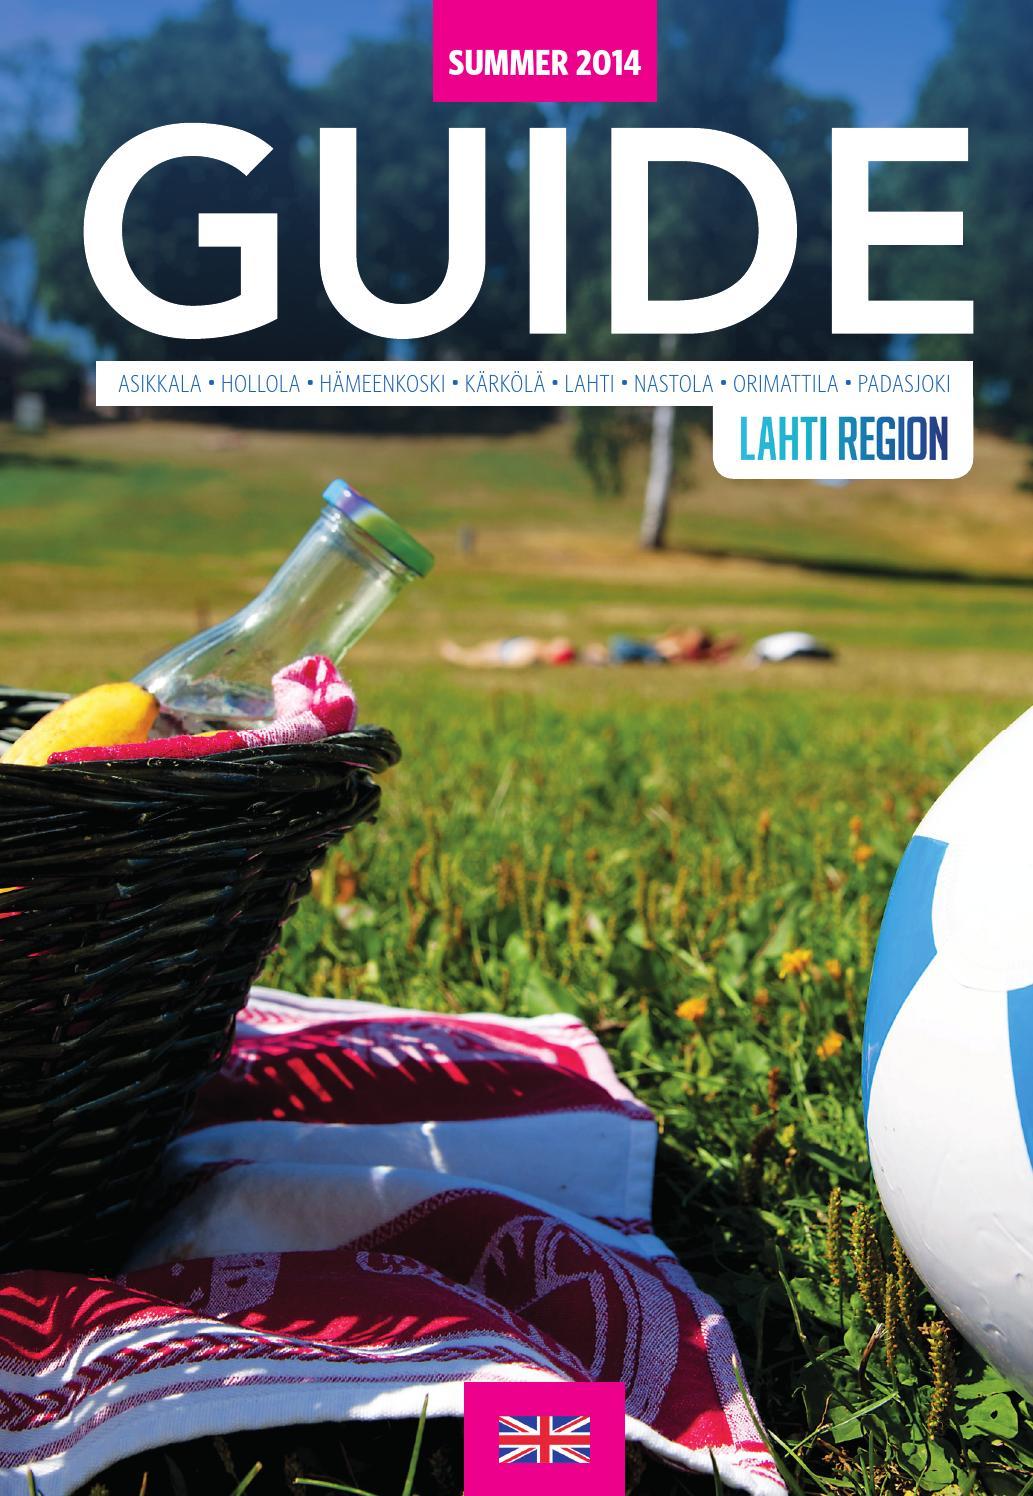 Lahti Guide 01 2014 by Viestintätoimisto Mageena - issuu e830dad35d